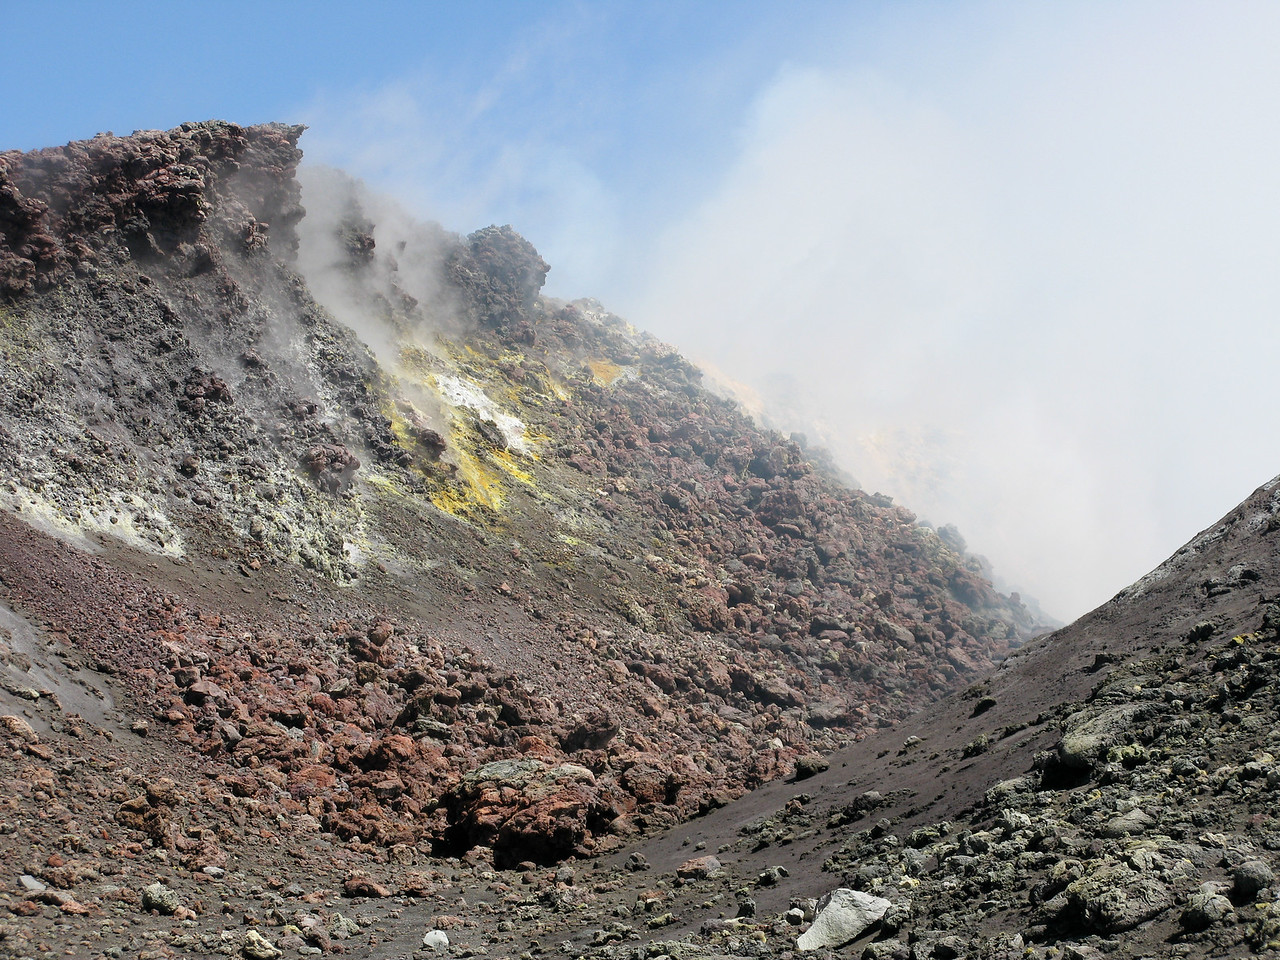 Sulfur fumes forming crystals